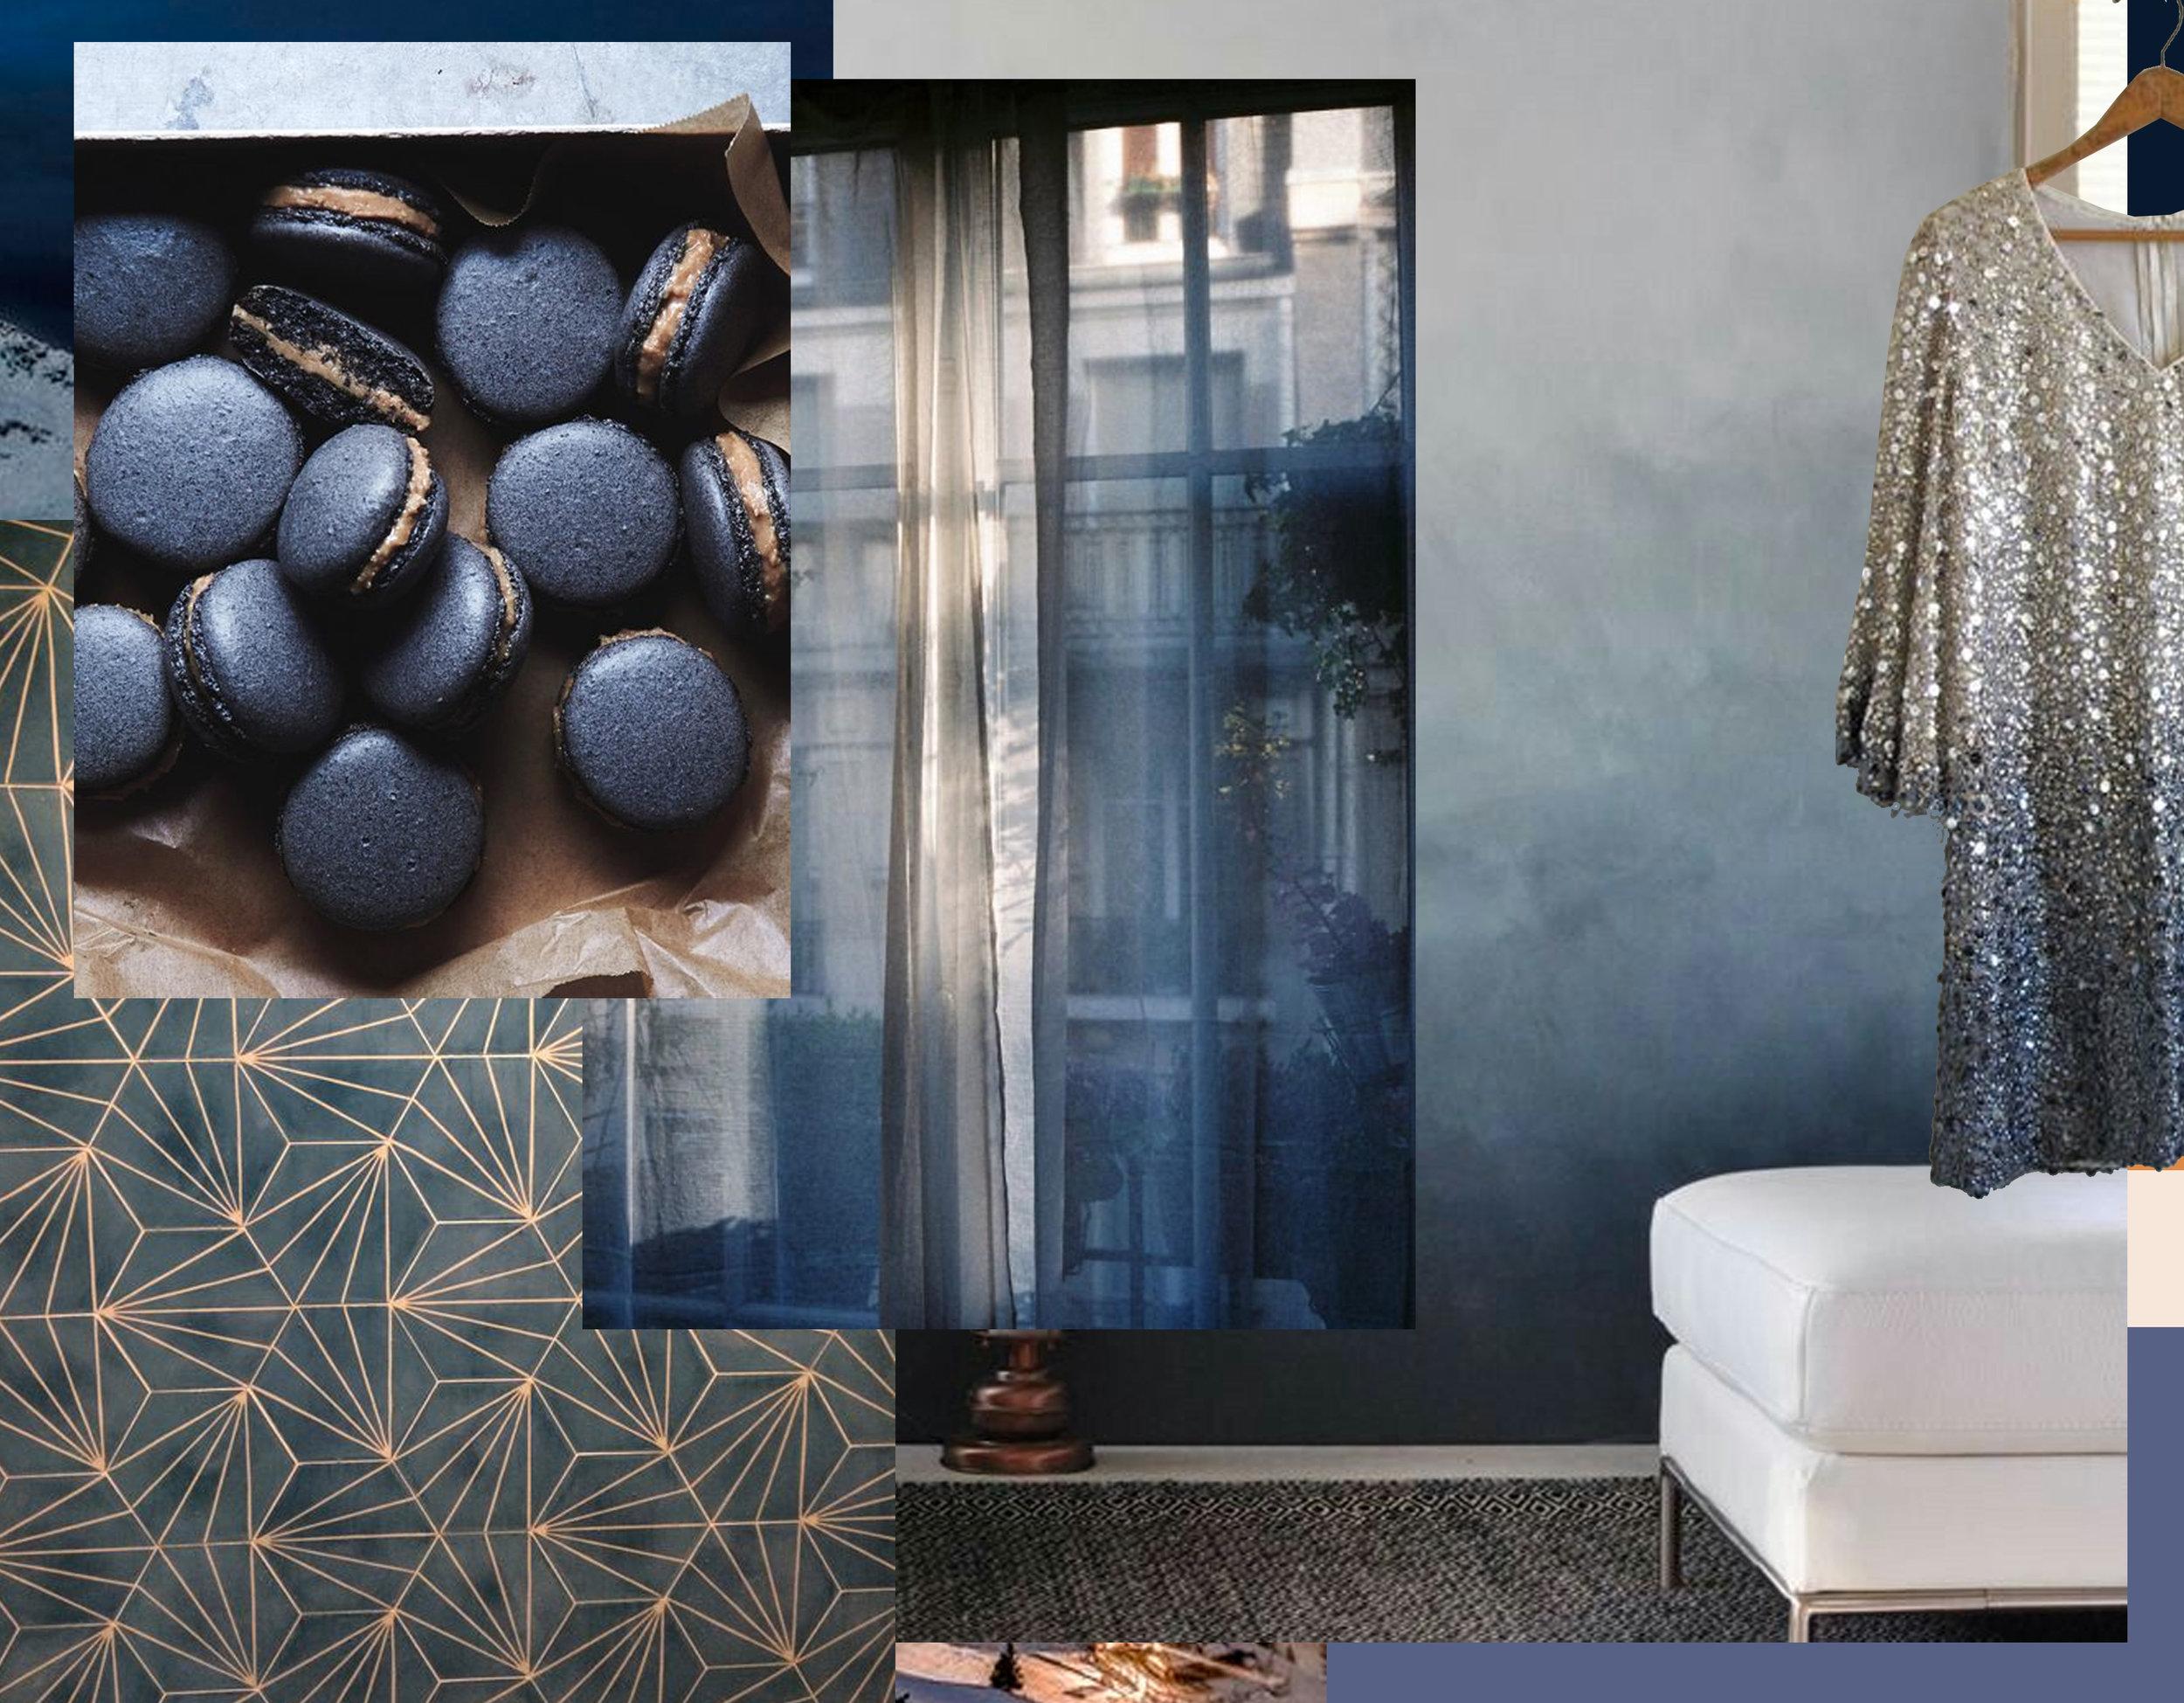 Dandelion ciment tile  Marrakech Design  - black sesame macarons via  The Tart Tart  - window image via  The Poetry of Material Things  - Ombre wall - sequin dress  The Elms Vintage